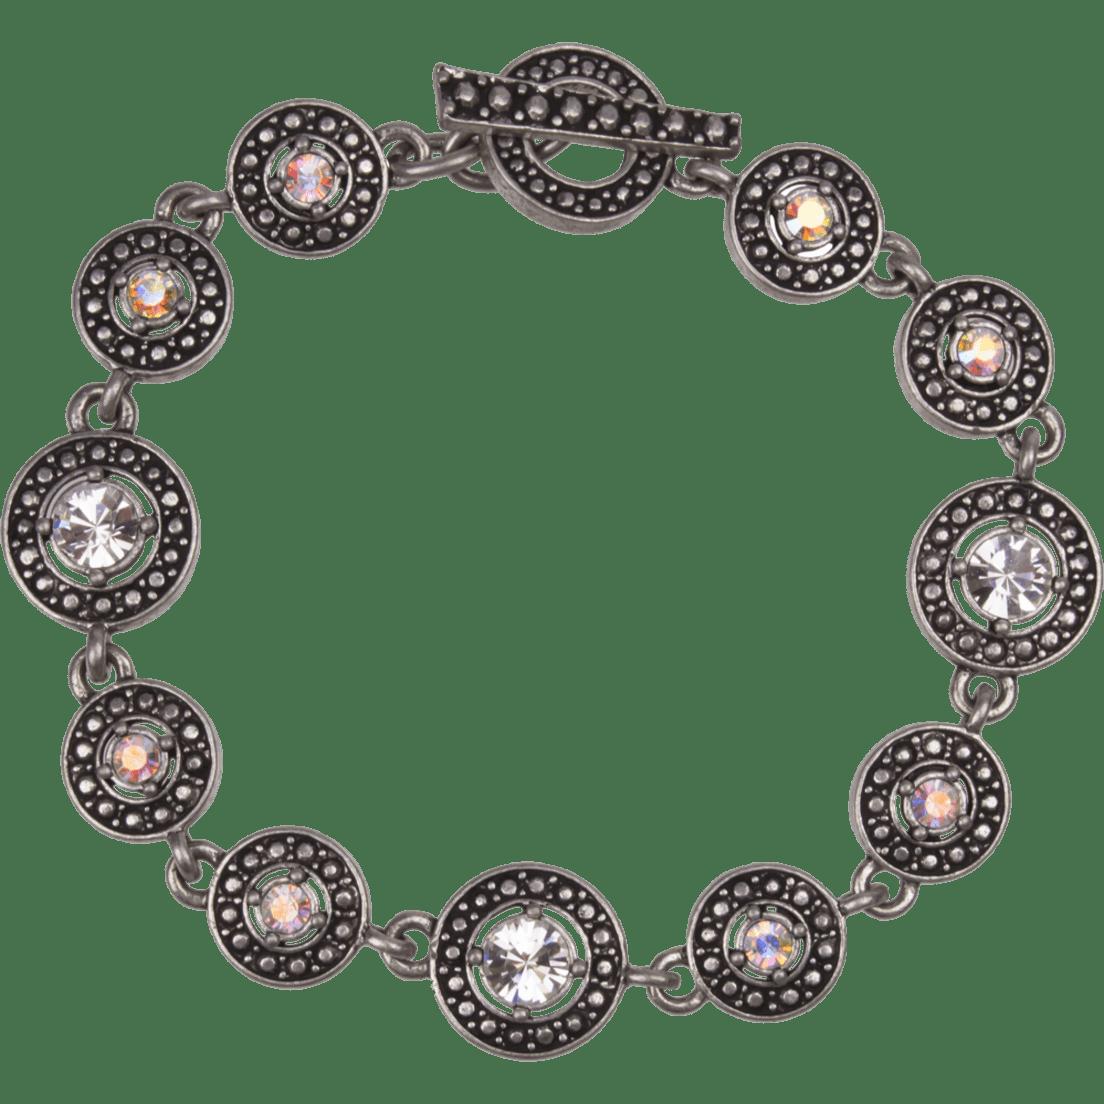 b04316bb7c596 Silver Circles Bracelet by Patricia Locke